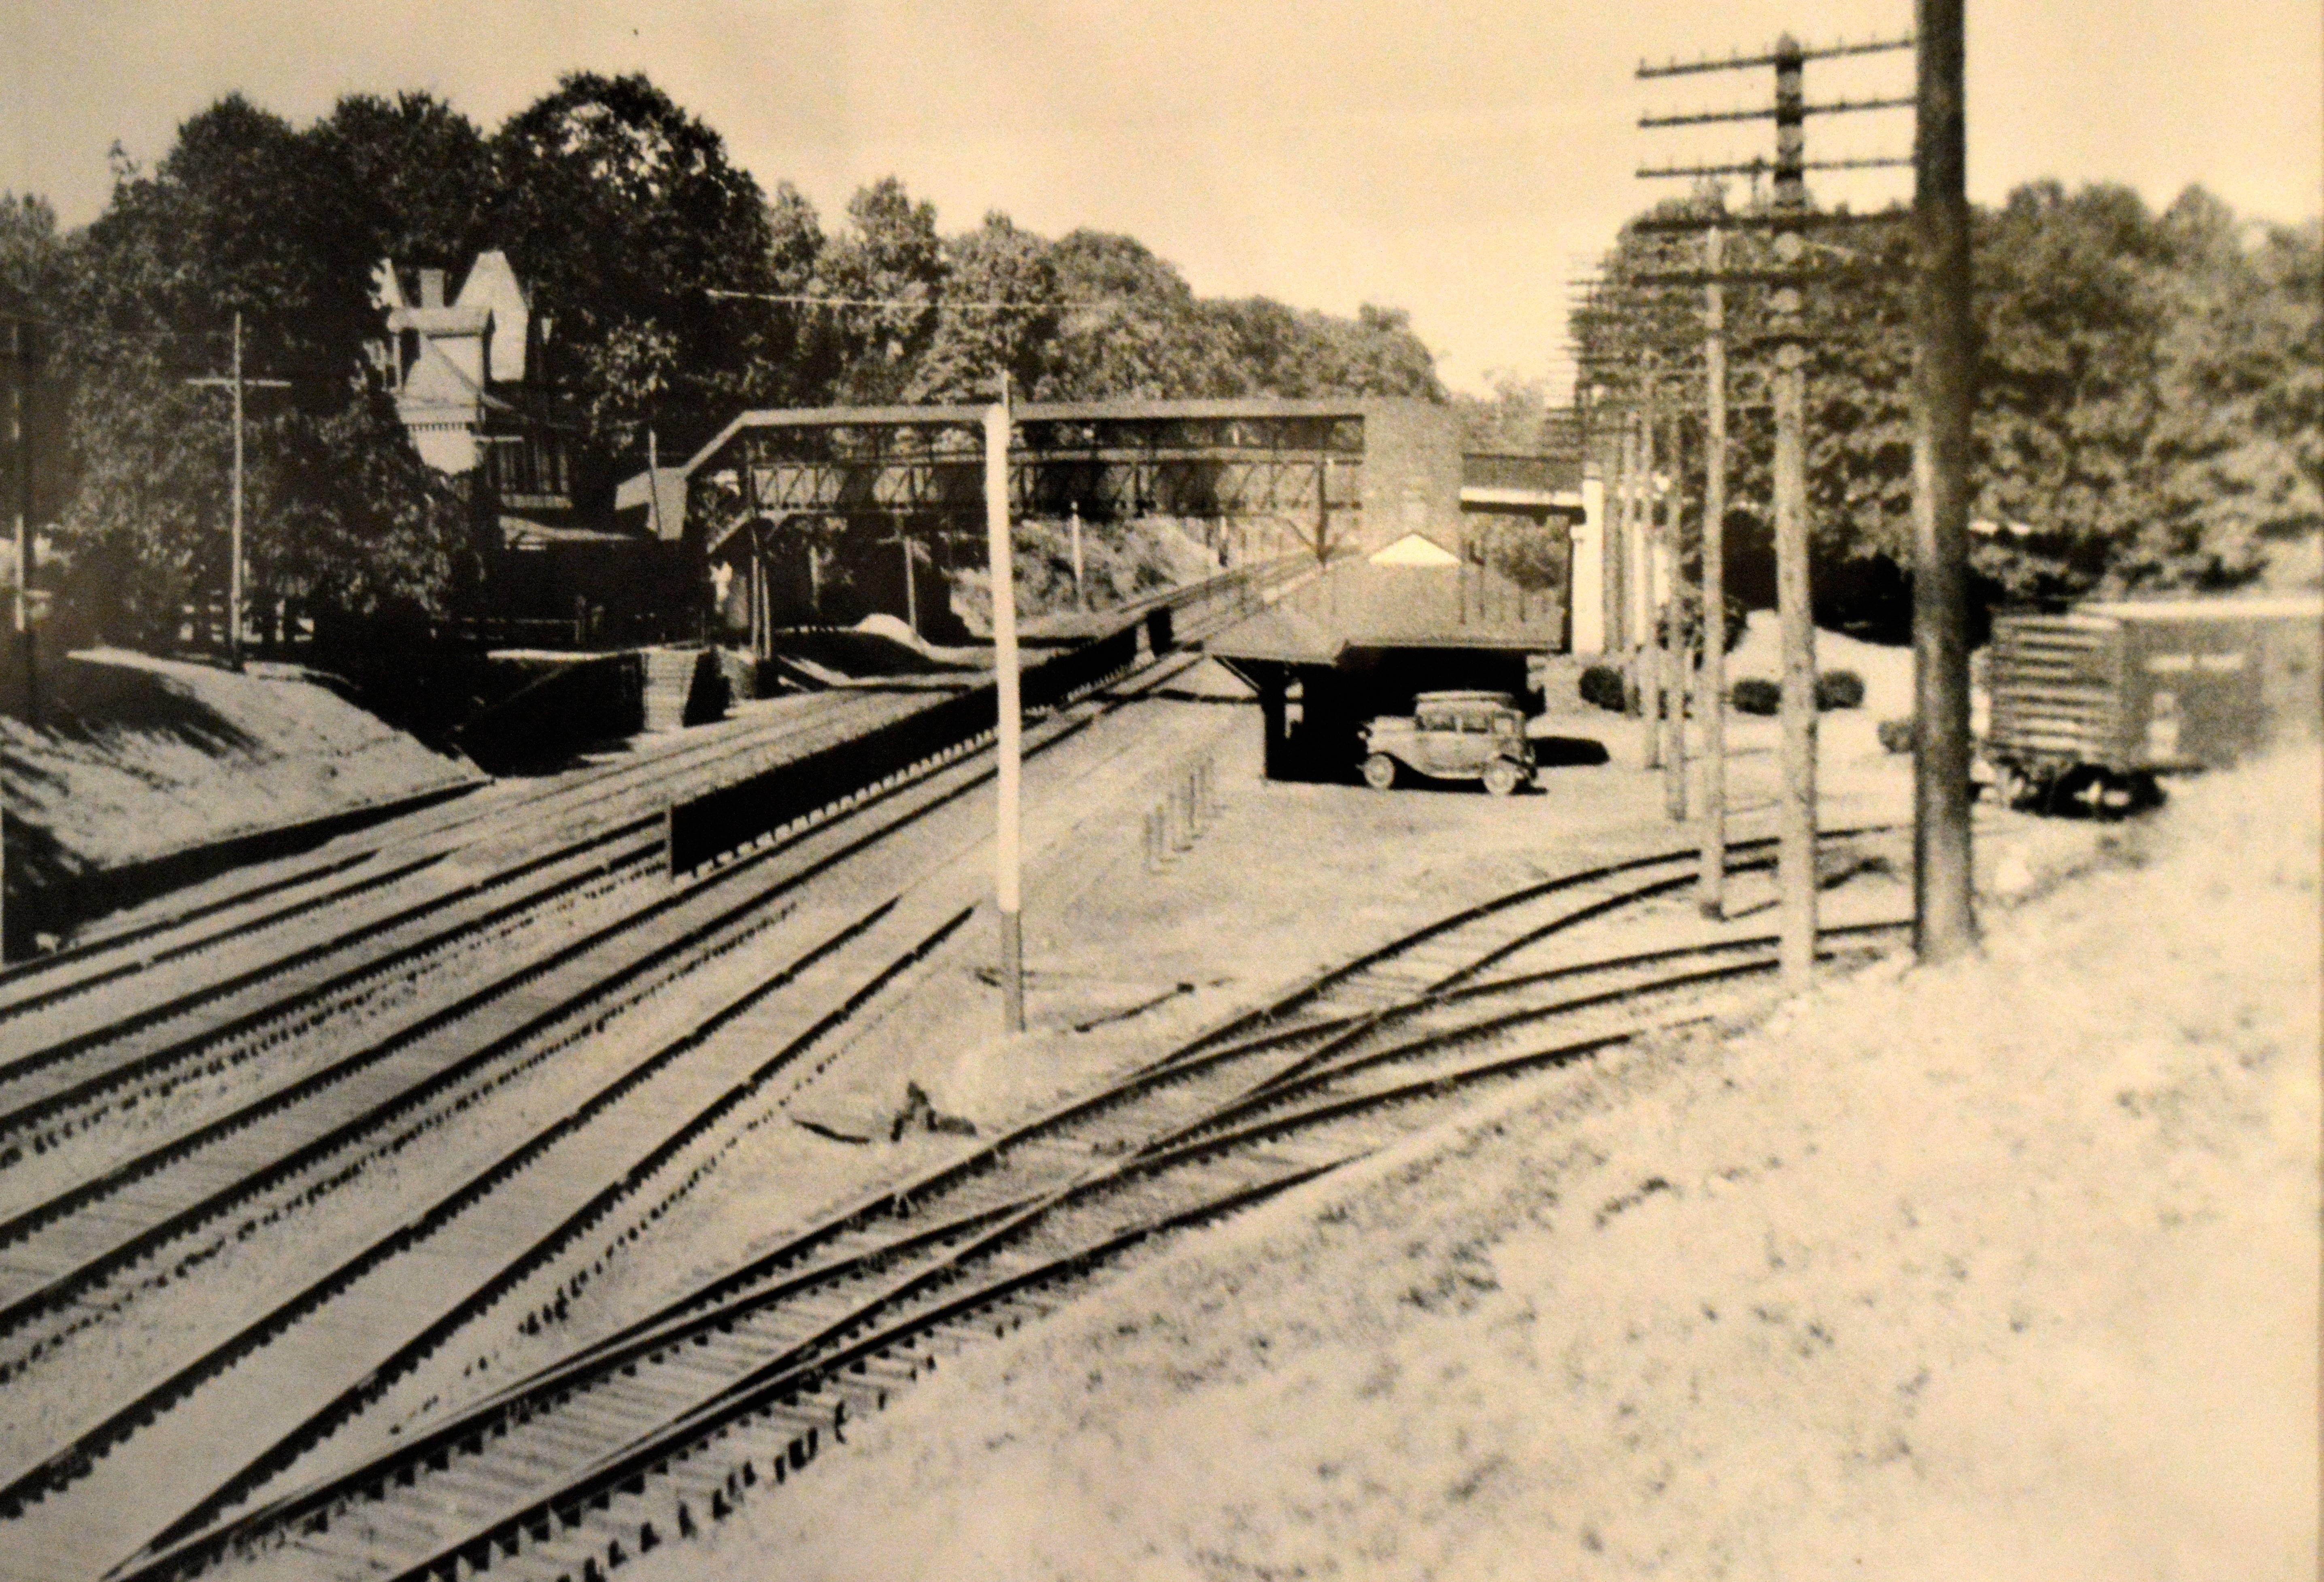 9c914c6214ccf89ab7b3_Train_vintage_photo.JPG